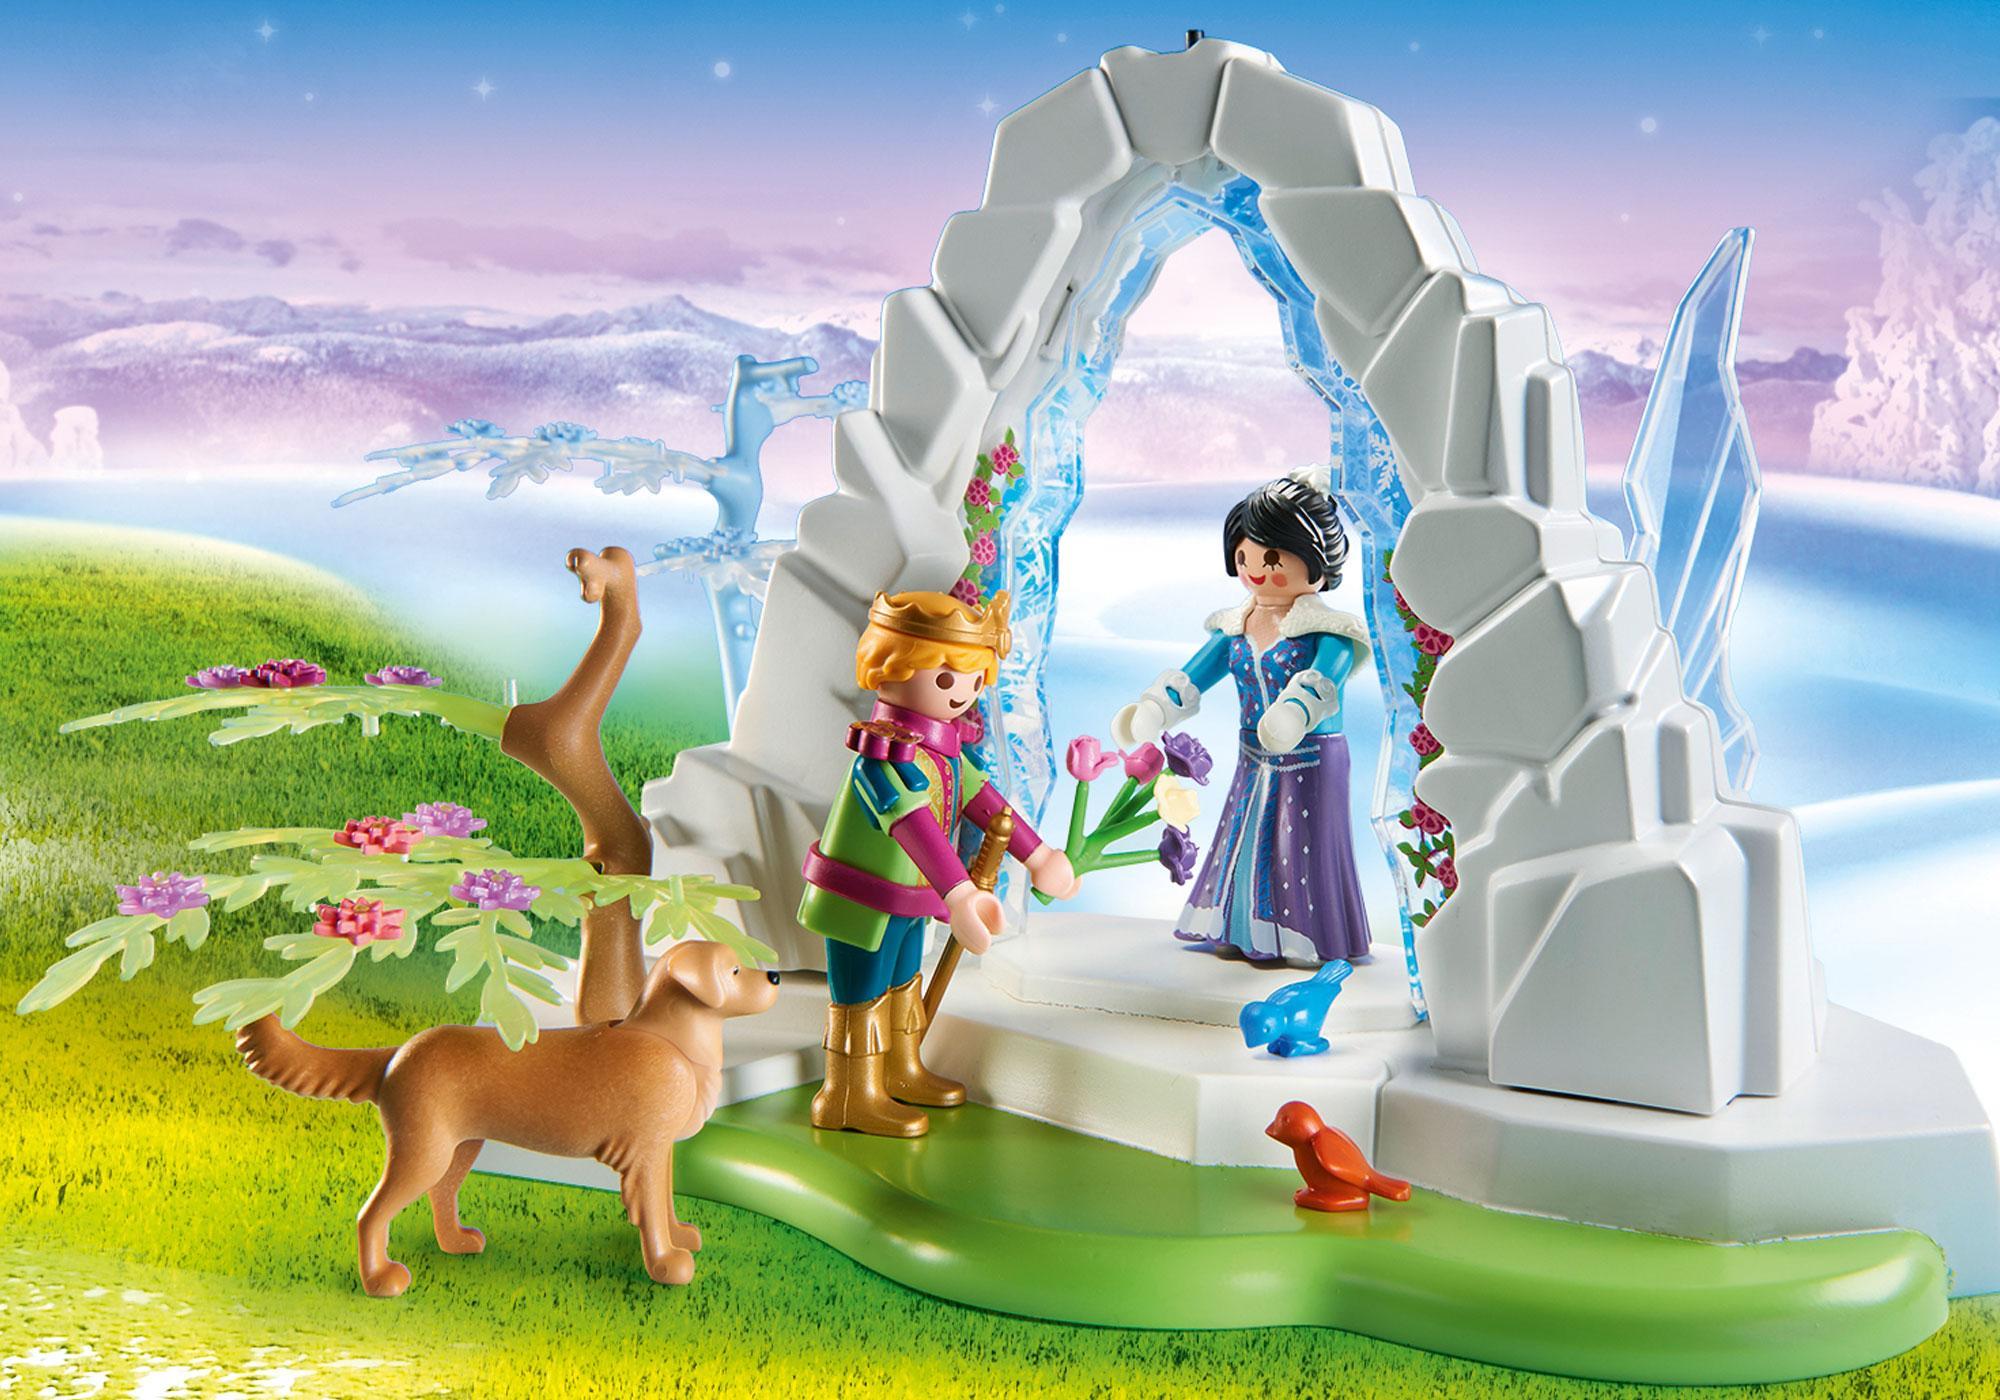 http://media.playmobil.com/i/playmobil/9471_product_extra1/Kristalltor zur Winterwelt